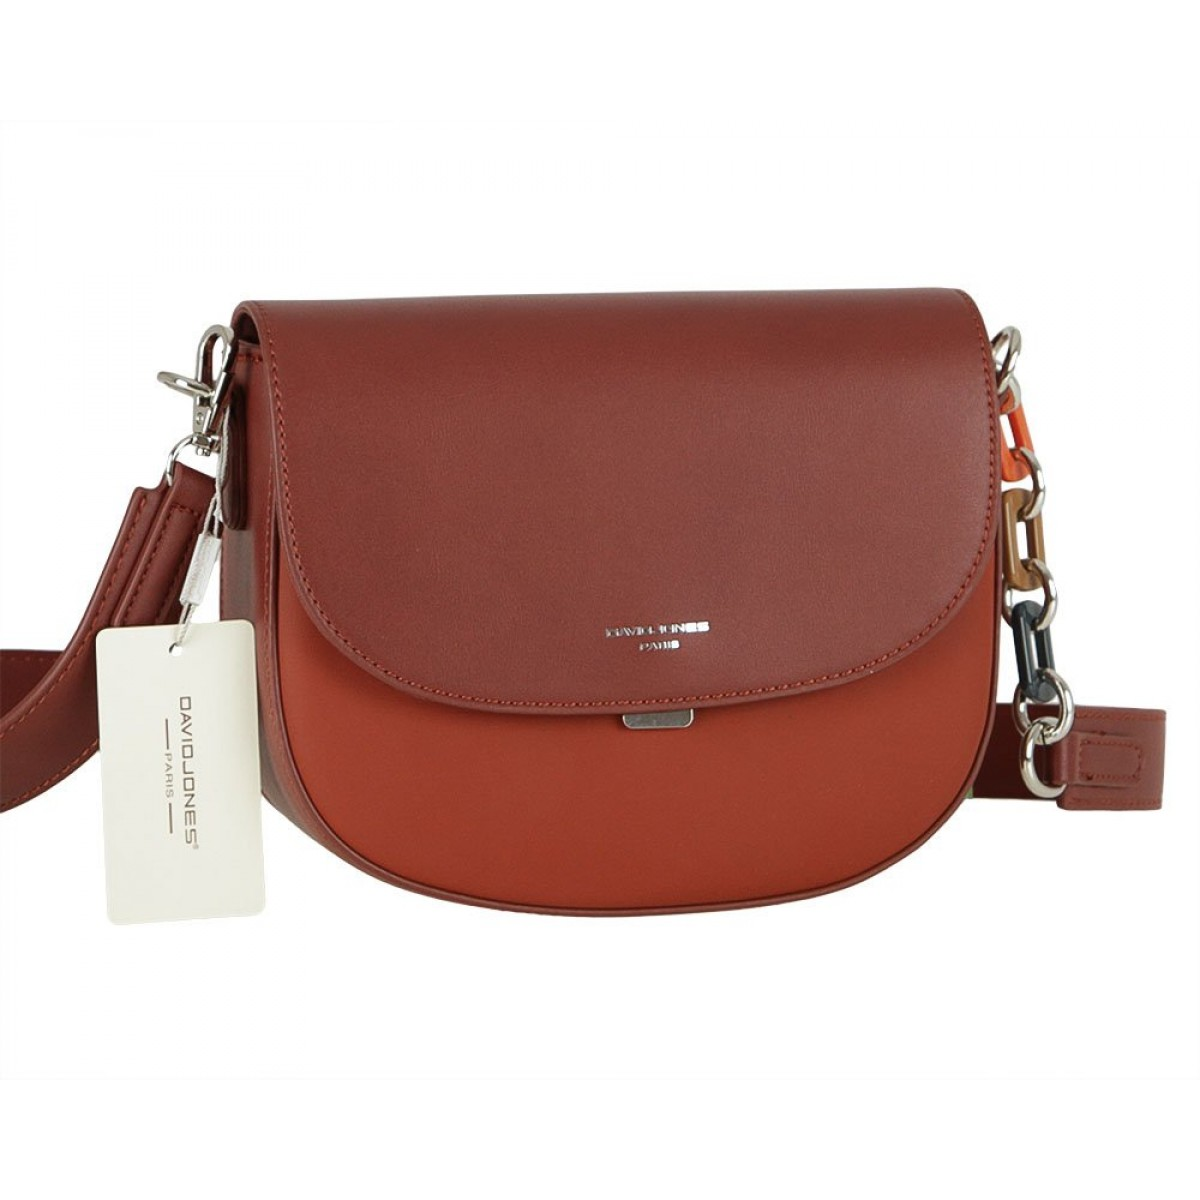 Жіноча сумка David Jones 6408-1 SIENNA